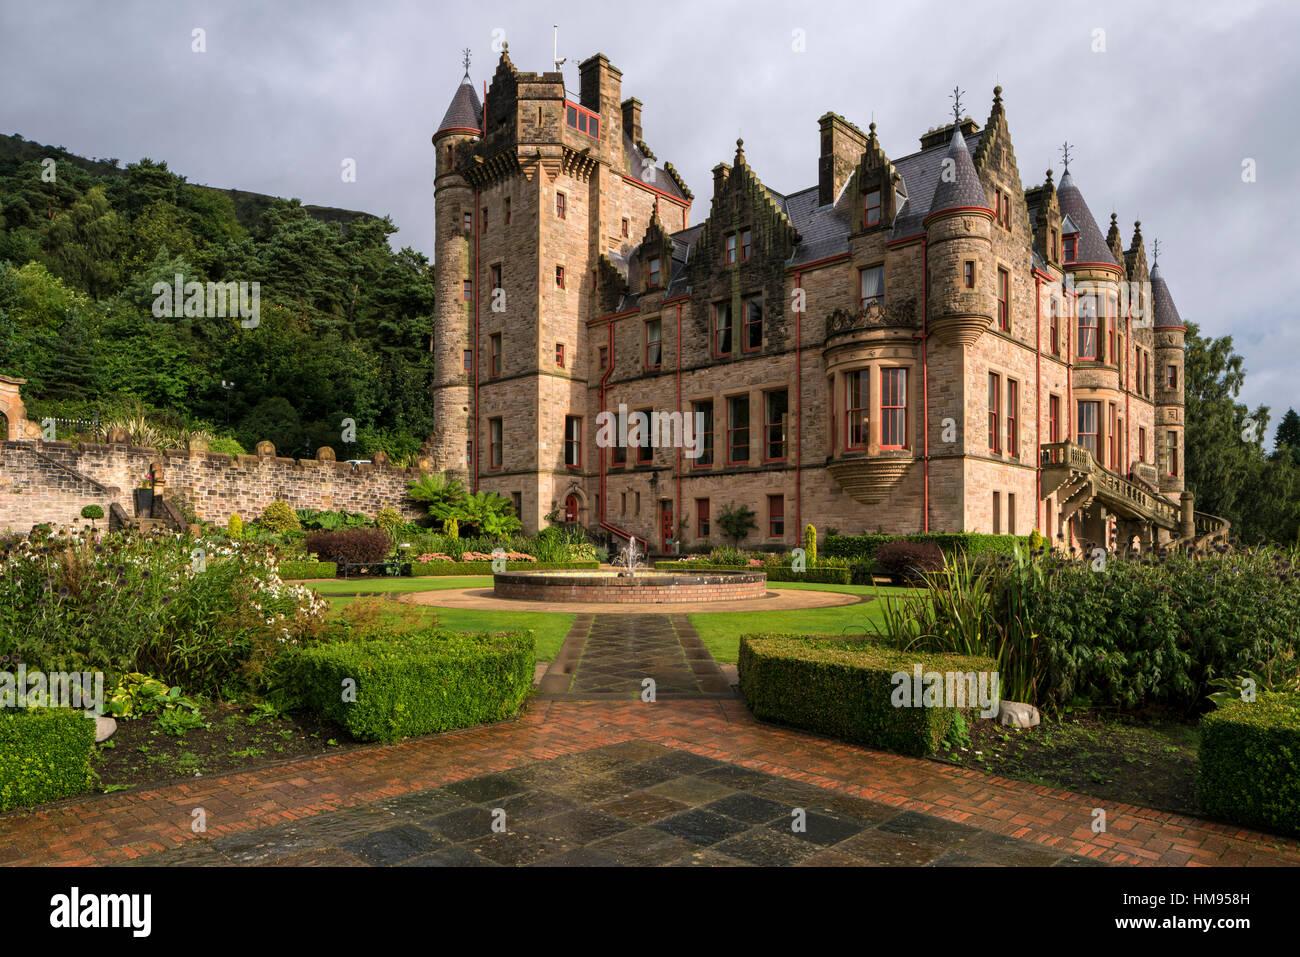 Belfast Castle, Belfast, Ulster, Northern Ireland, United Kingdom - Stock Image